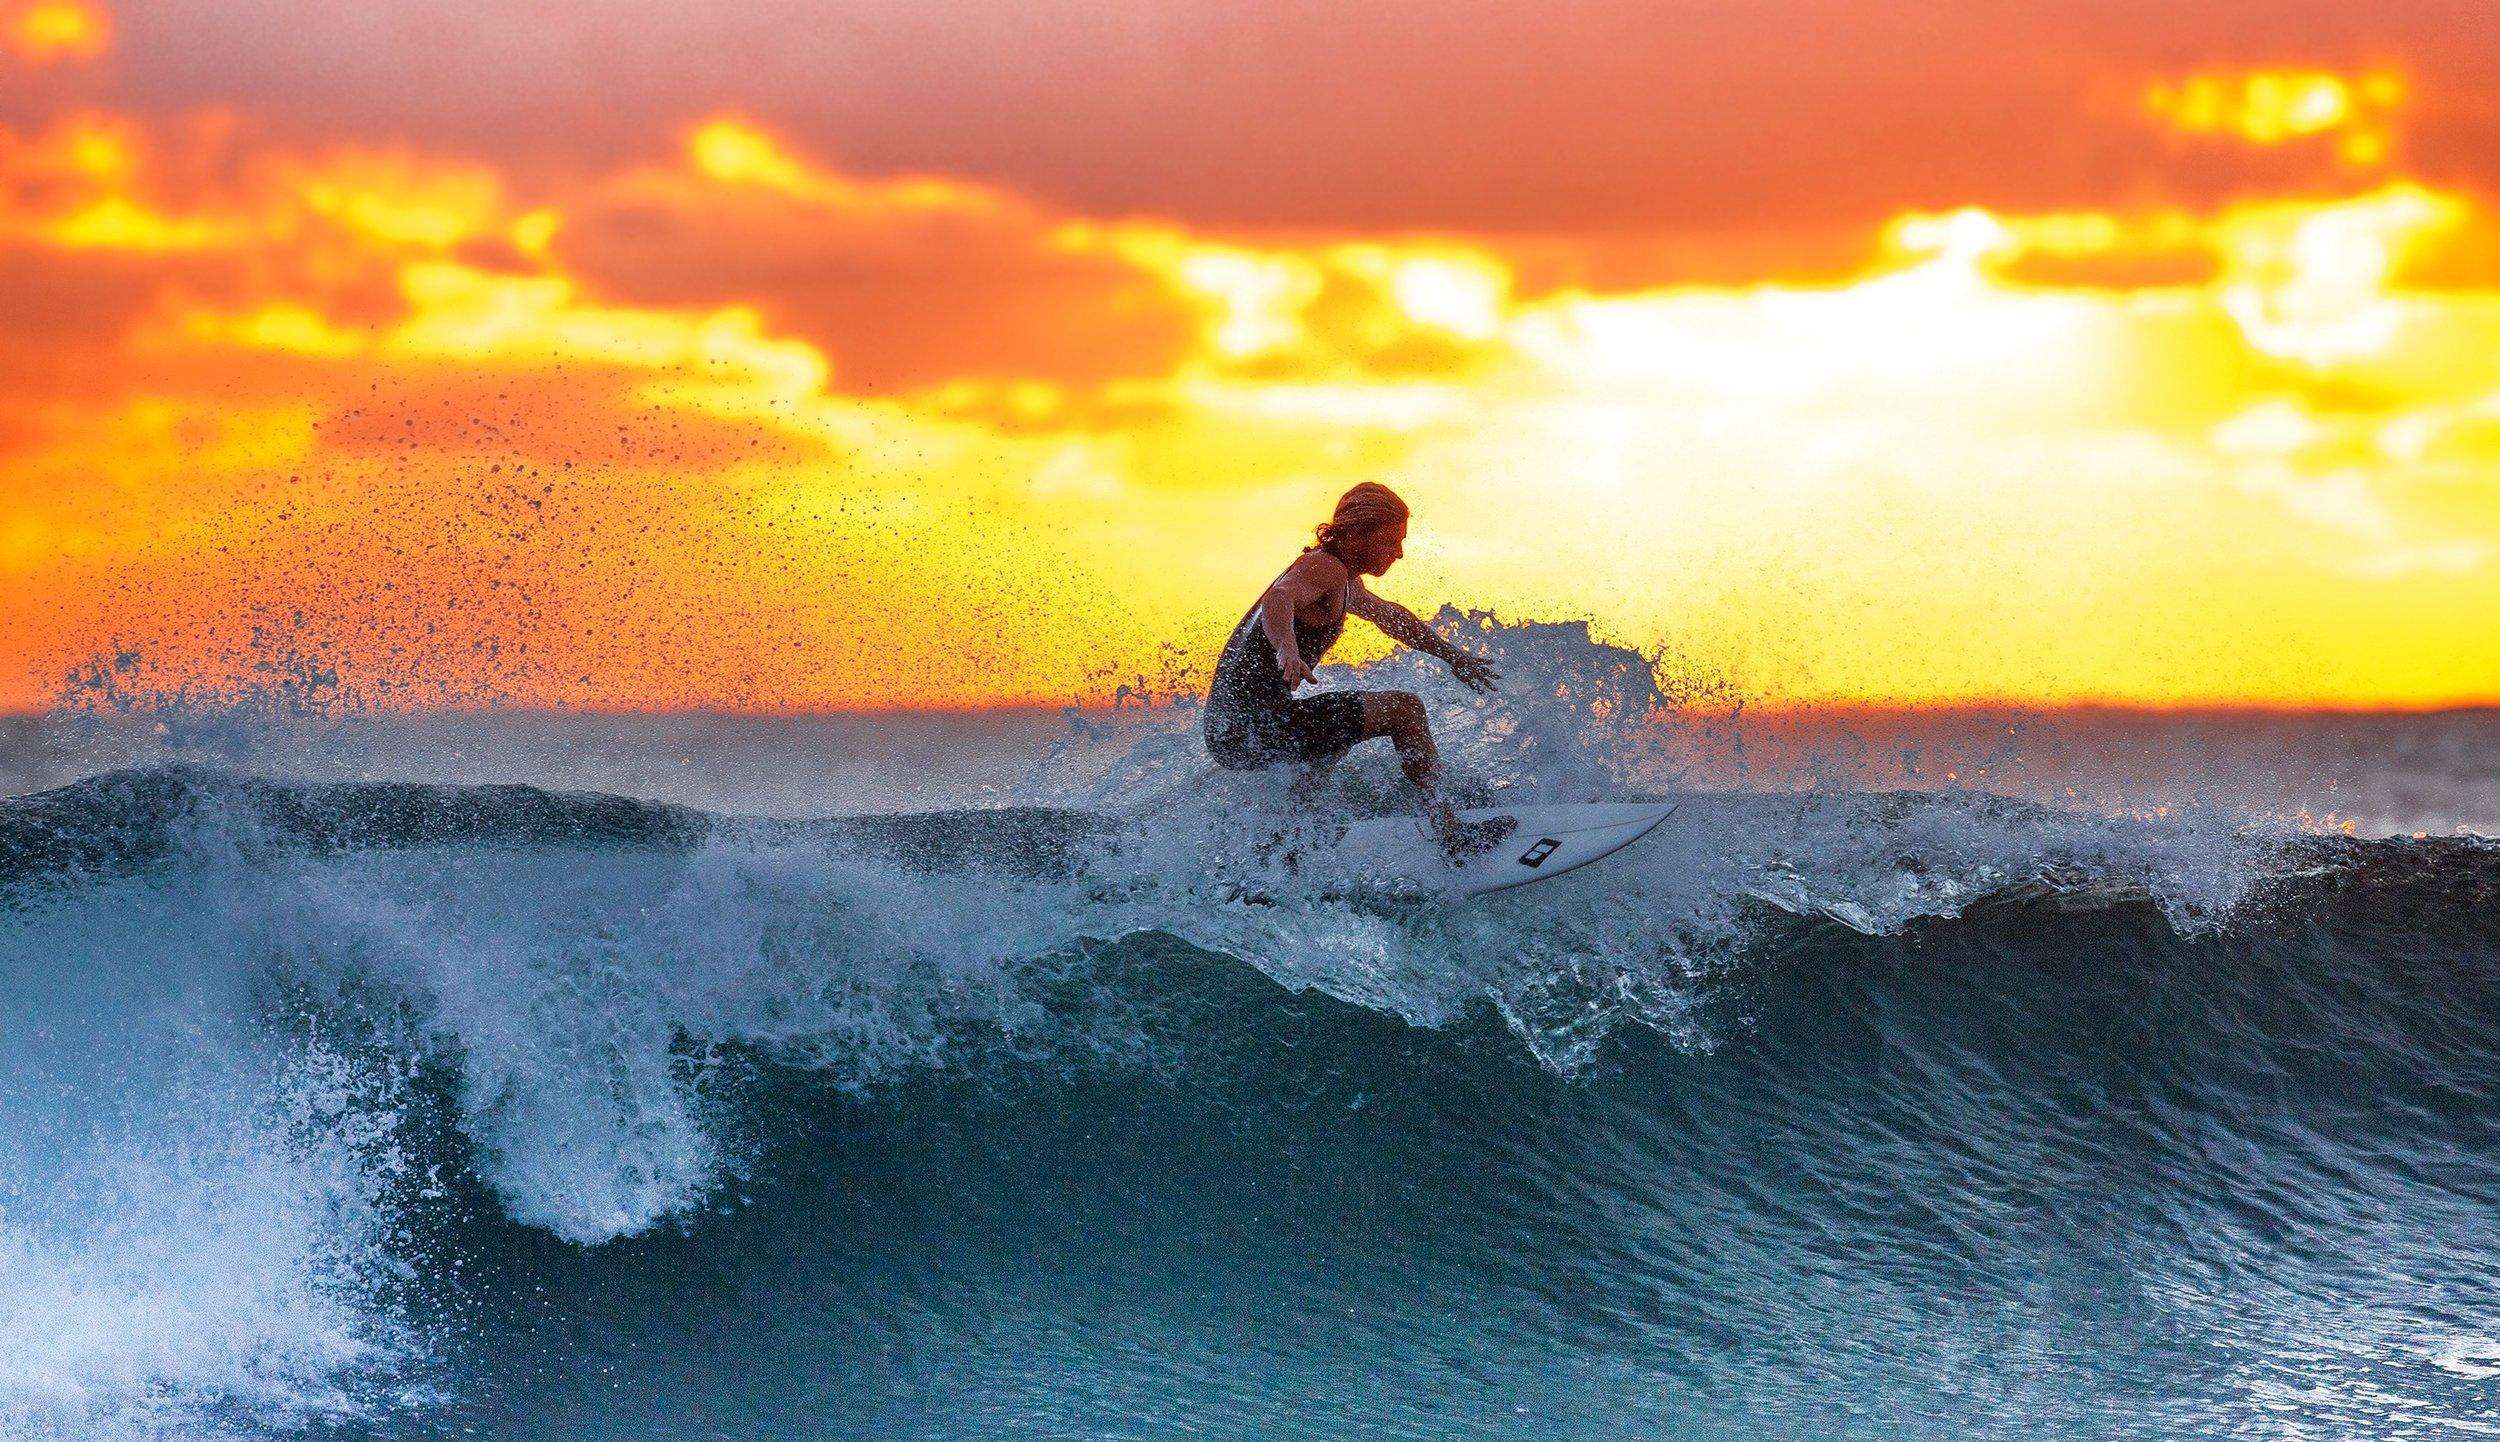 Surfing on the Ujung Origin Coast, Java, Indonesia